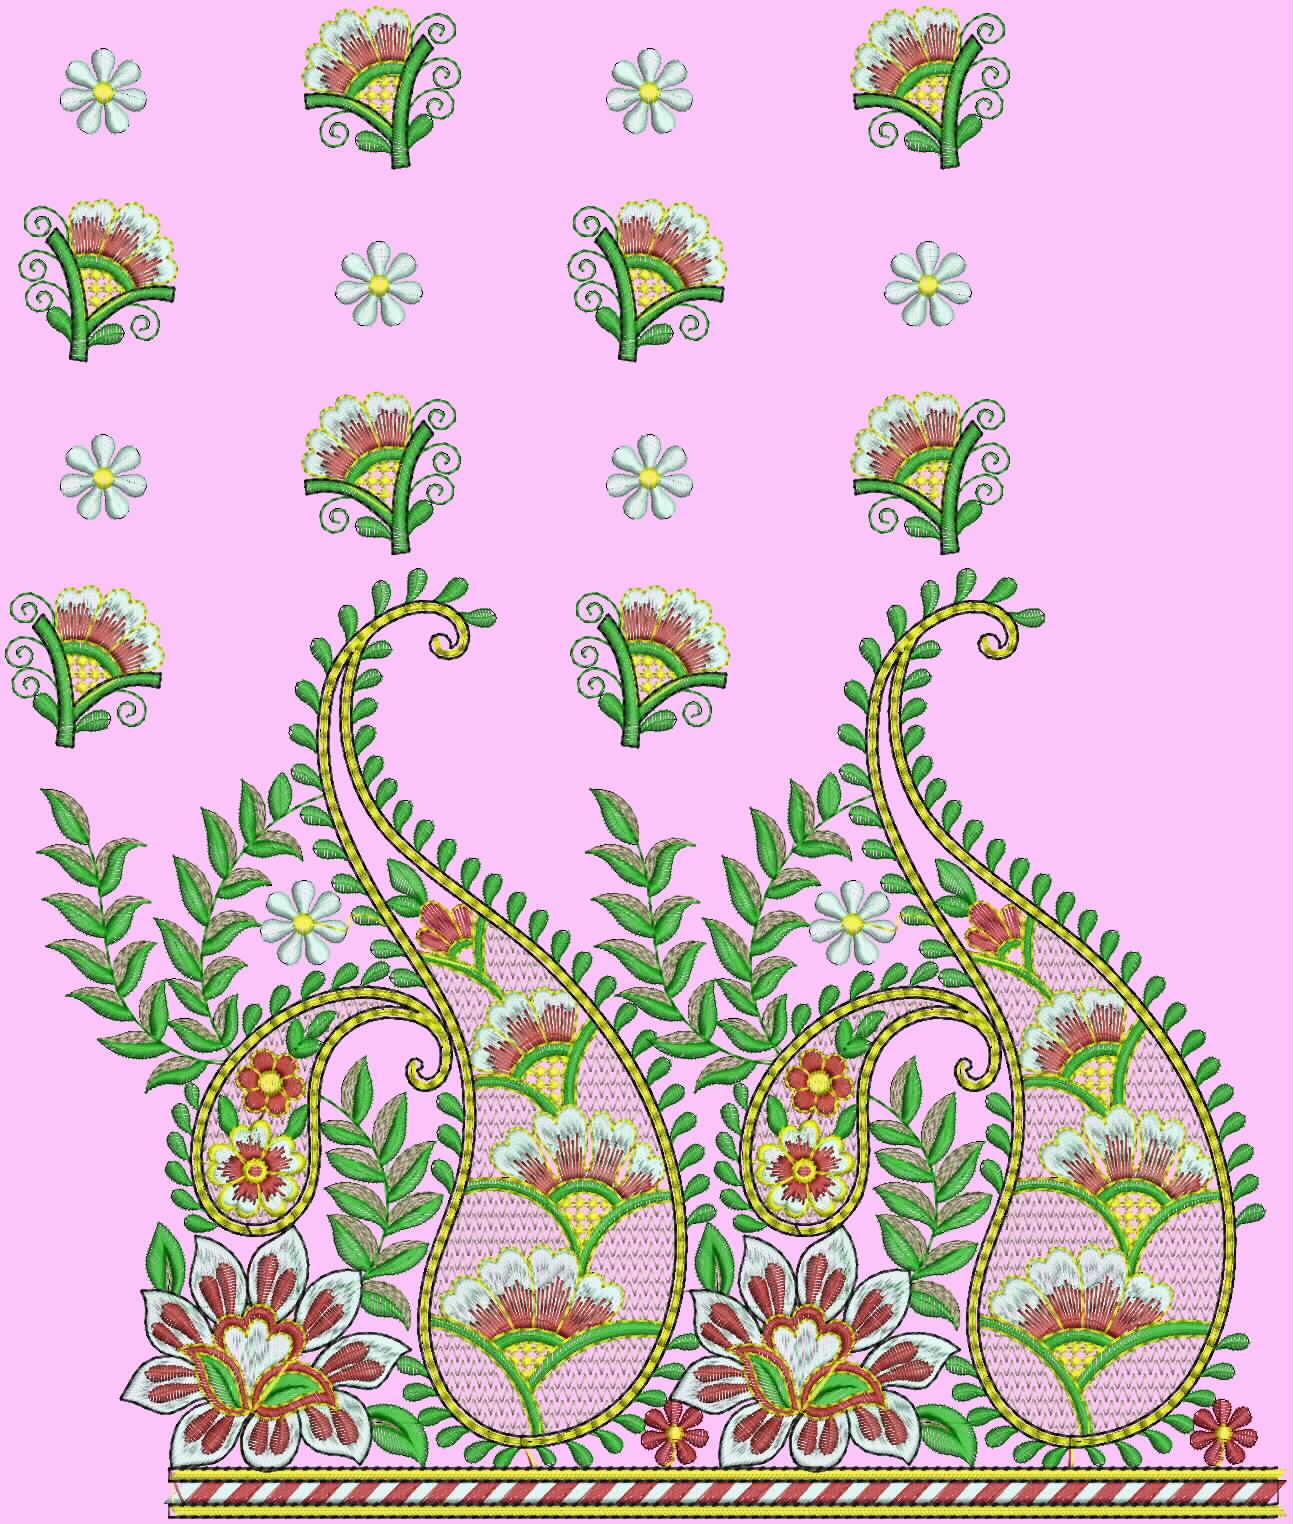 Fashion saree with embroidery saree designs makaroka embroidery saree design bankloansurffo Gallery